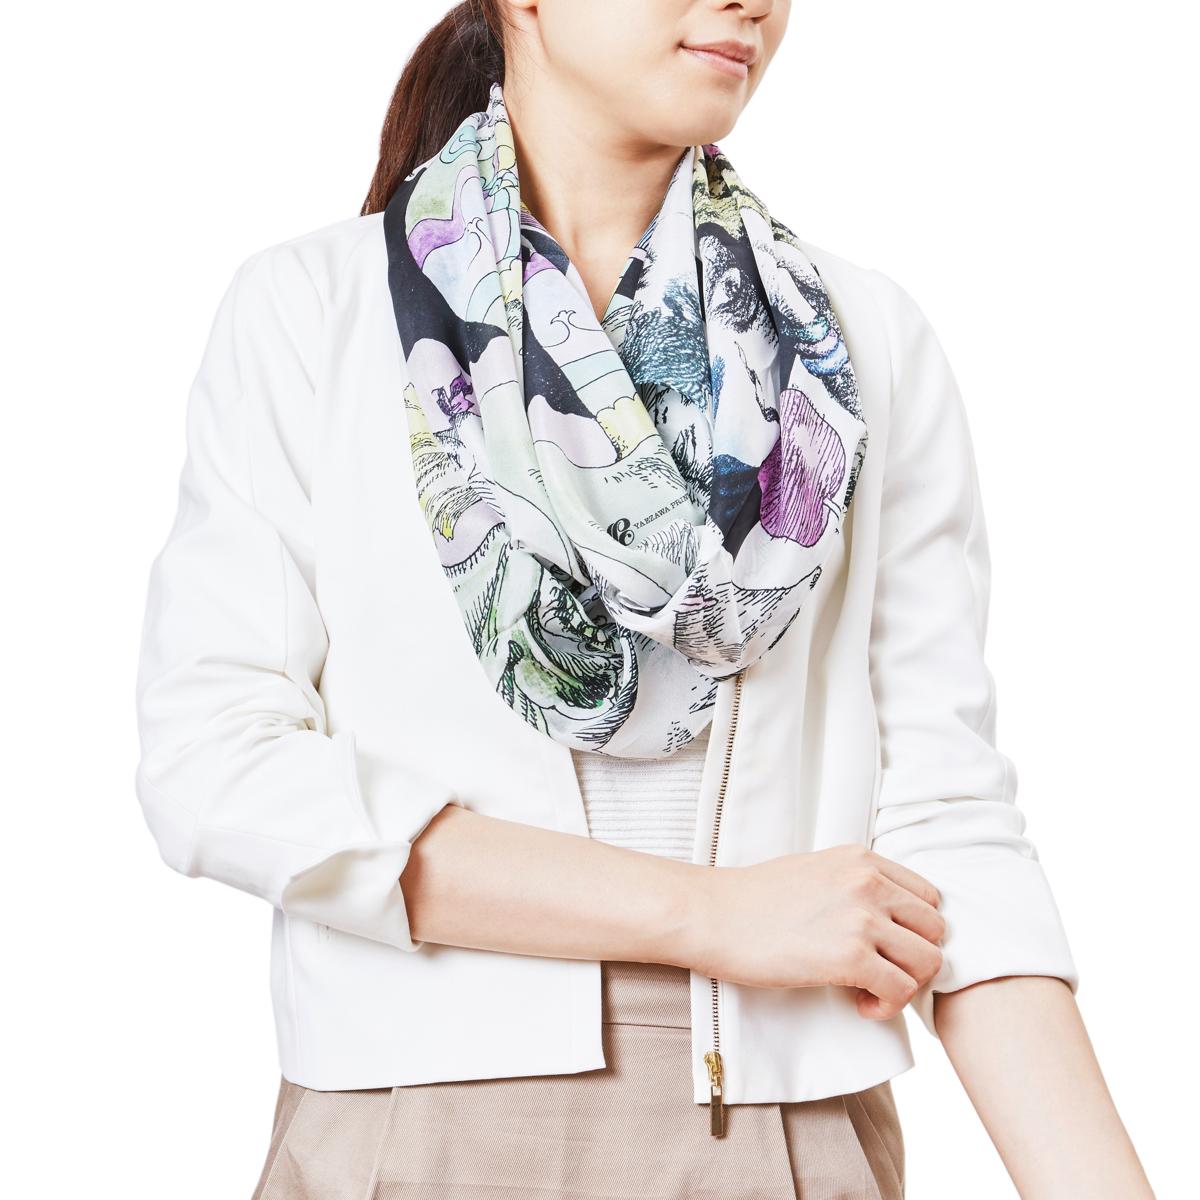 yaezawaとコラボ 宇野亜喜良氏の作品を織り込んだスカーフとストール